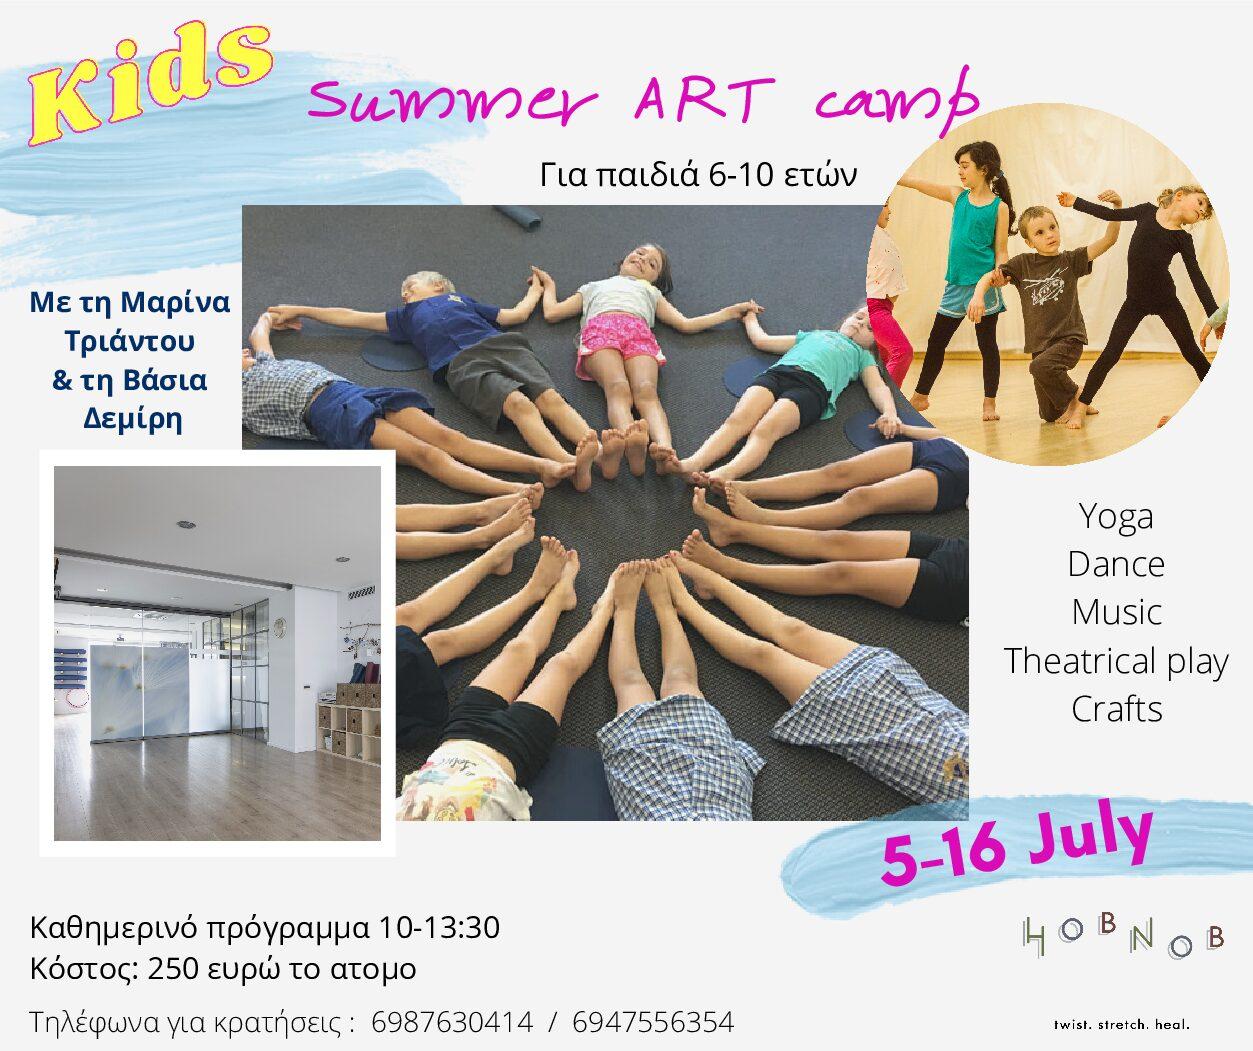 Hobnob Kids summer Arts camp